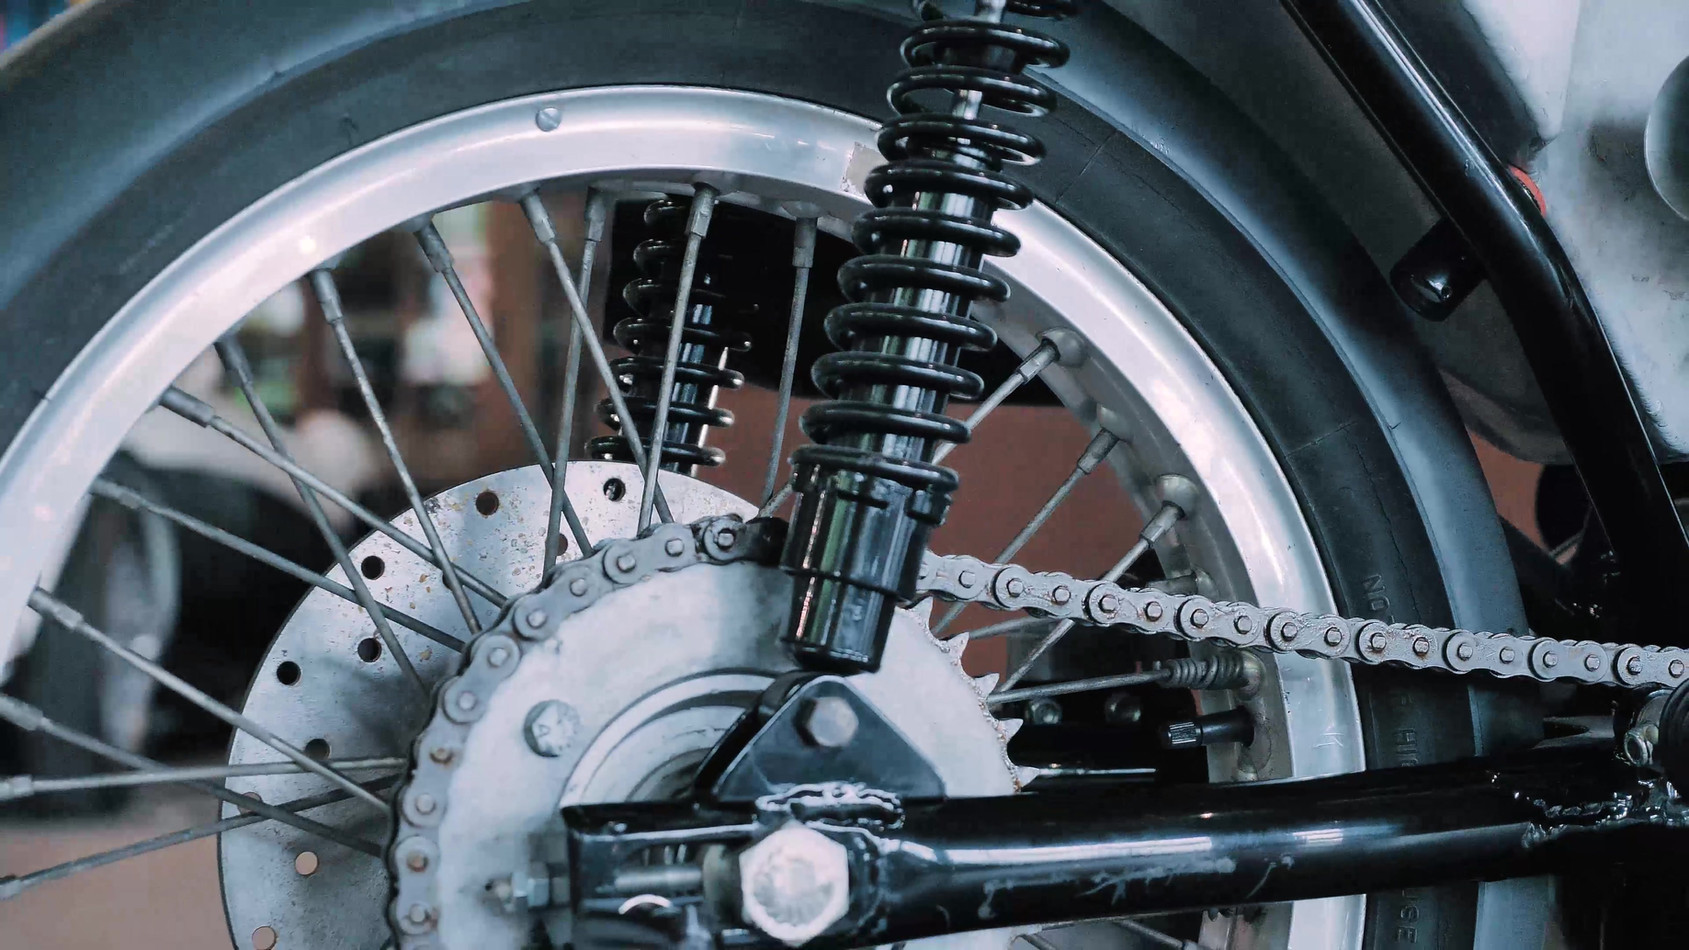 Harleybike.mp4